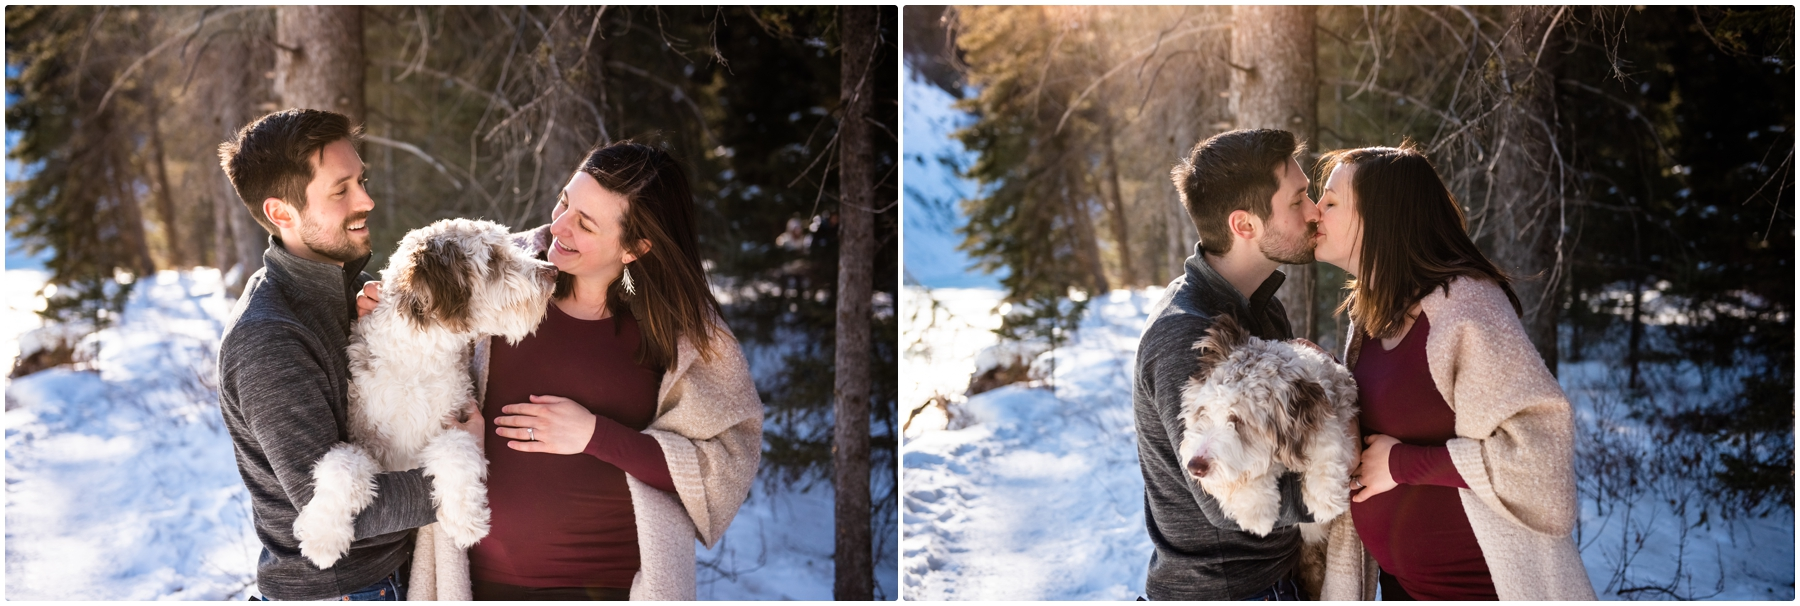 Calgary Winter Maternity Photographer Fish Creek Park